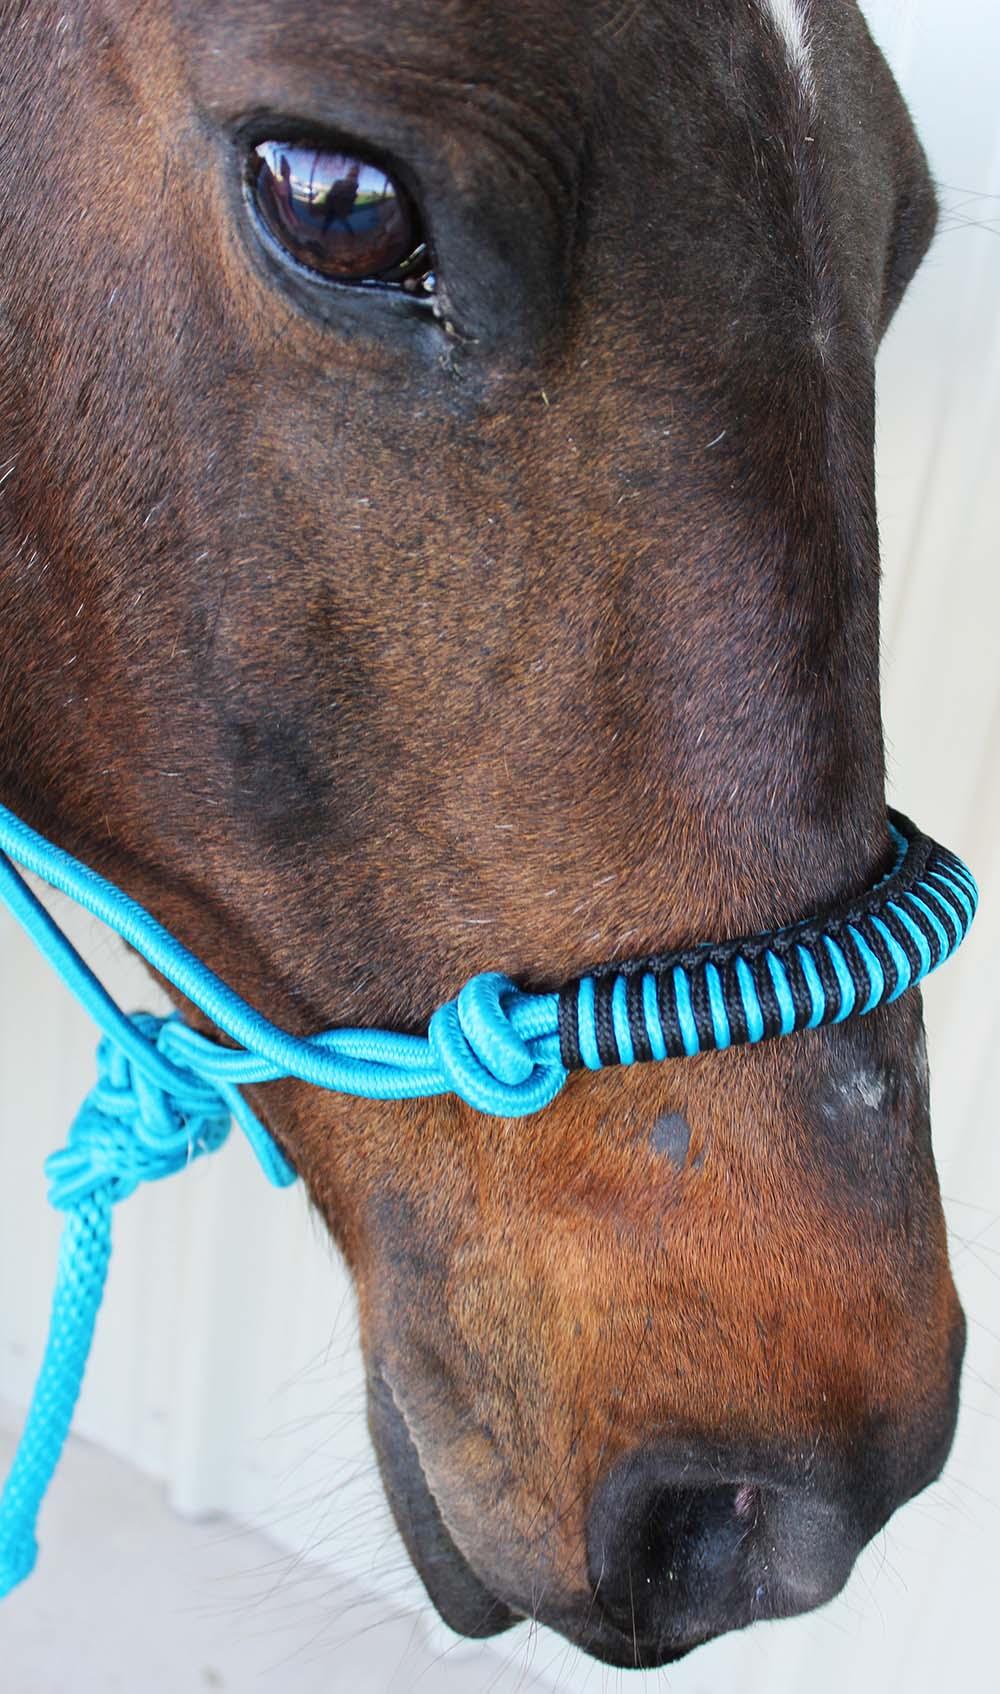 Nylon Braided Horse Rope Halter Lead Noseband Tack Equine Rodeo Bundling 1 Navy M